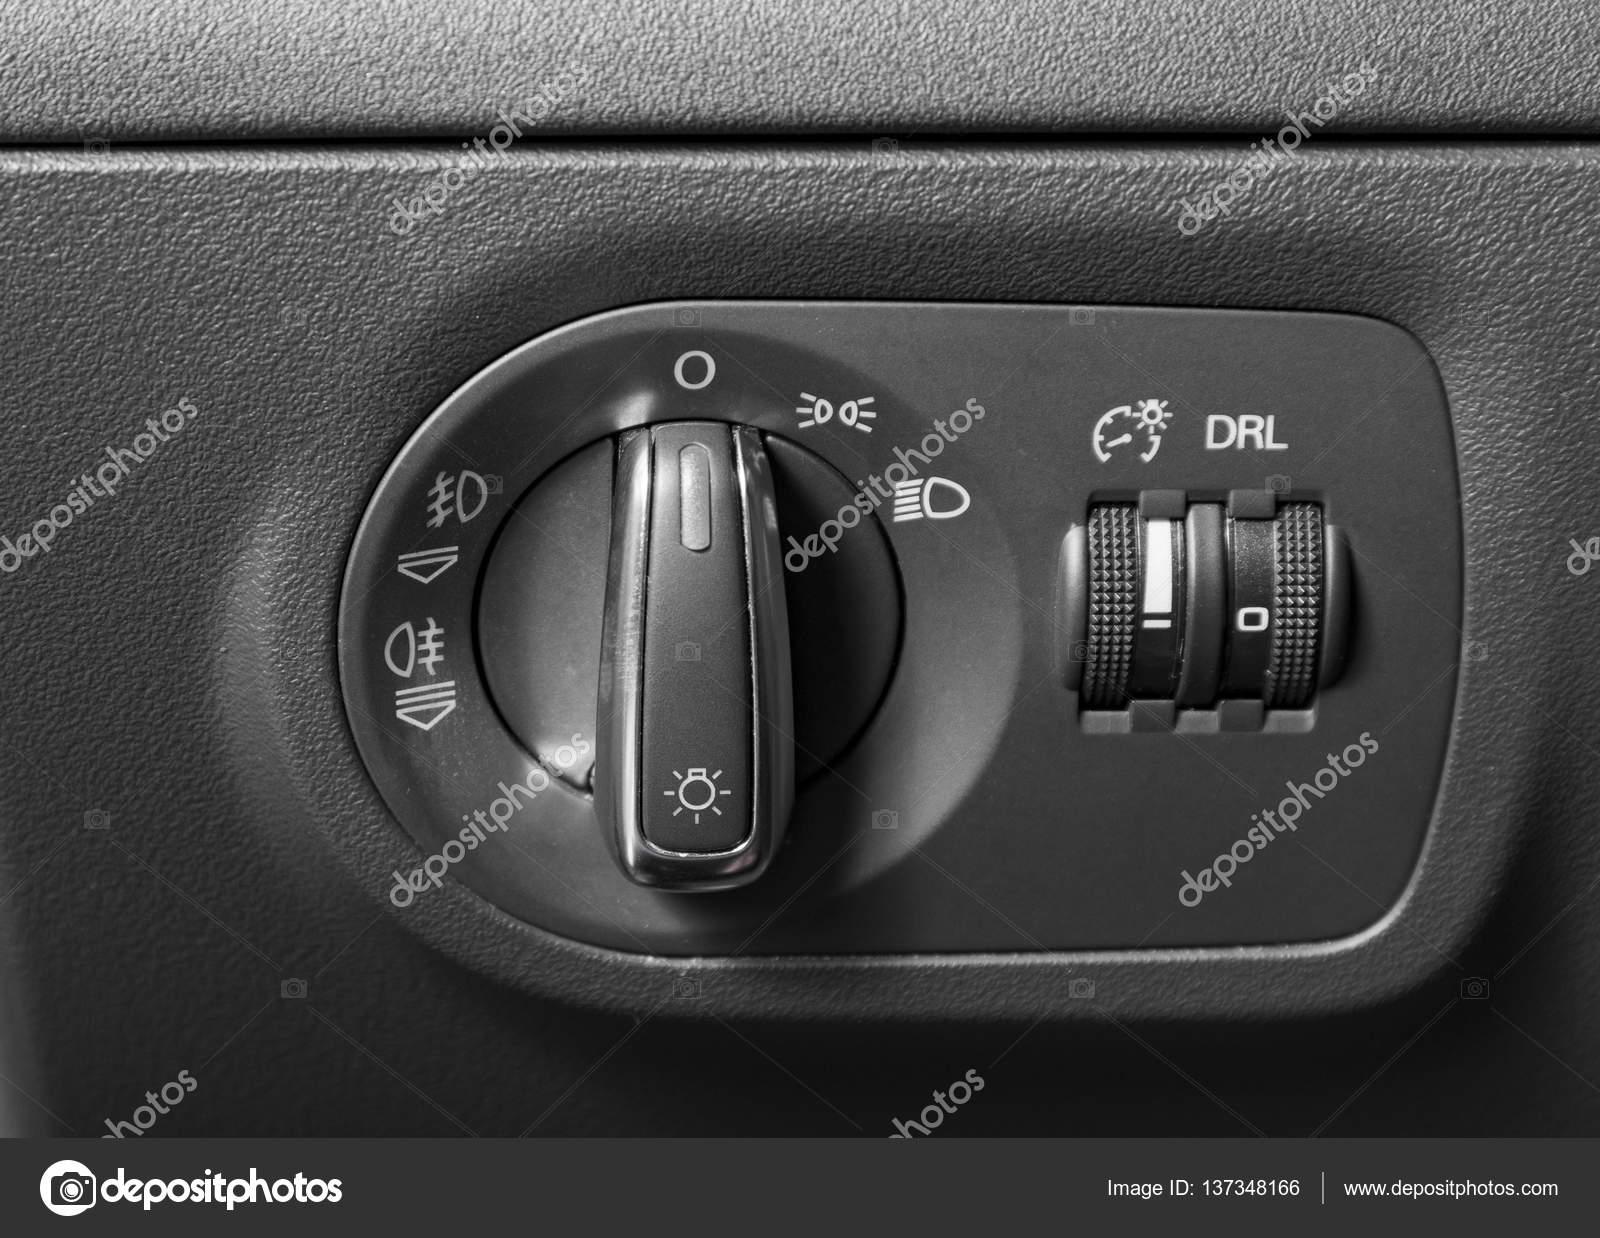 https://st3.depositphotos.com/1407534/13734/i/1600/depositphotos_137348166-stockafbeelding-auto-verlichting-controle-knop-switcher.jpg